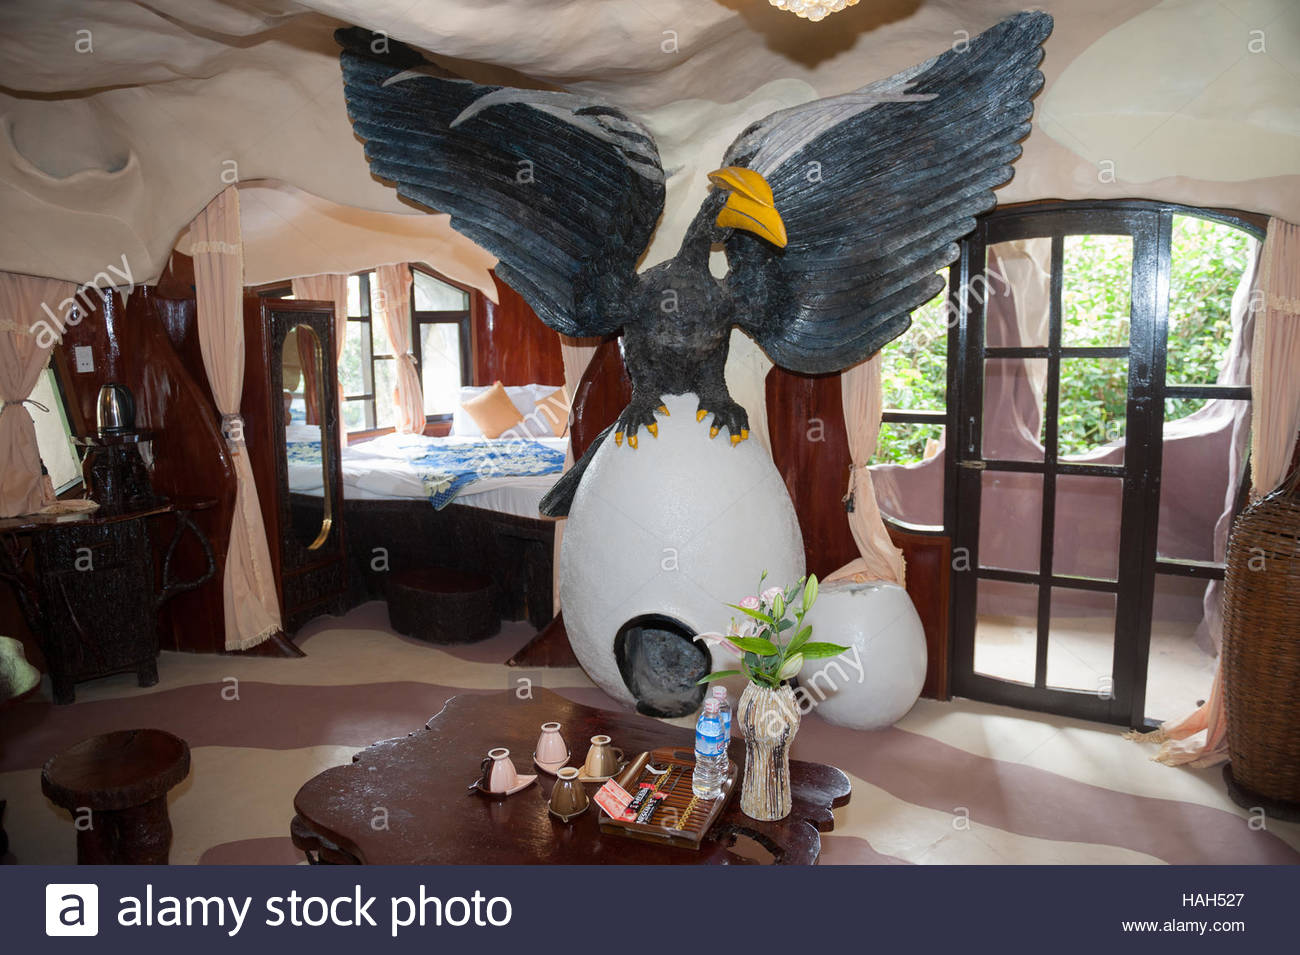 Dalat Vietnam Hang Nga Crazy House. Idiosyncratic design and surreal ...